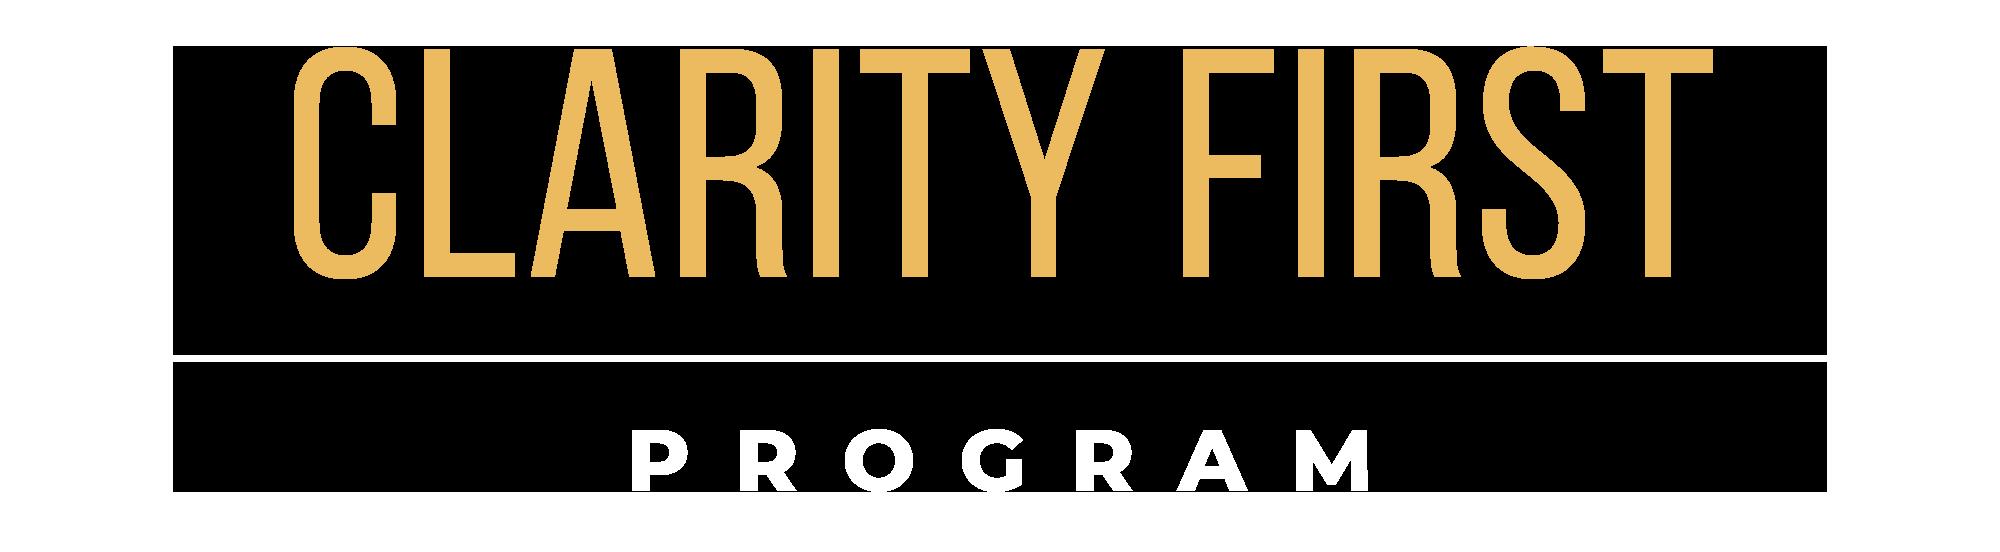 Learn | Clarity First Program